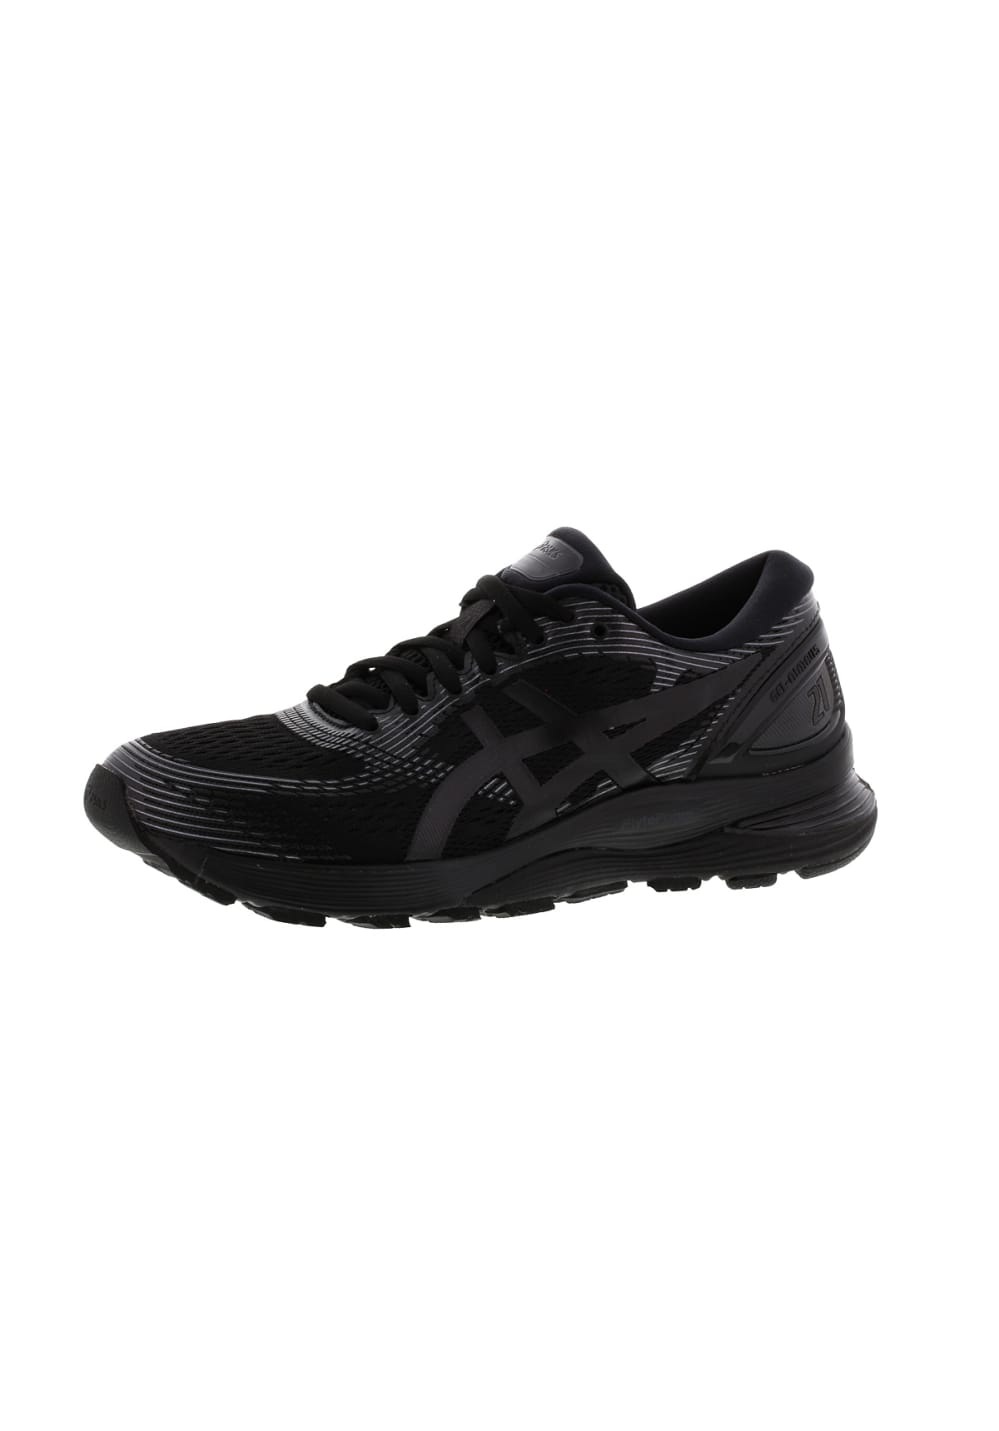 Noir Gel Running Pour Chaussures 21 Nimbus Femme Asics TFcl13uKJ